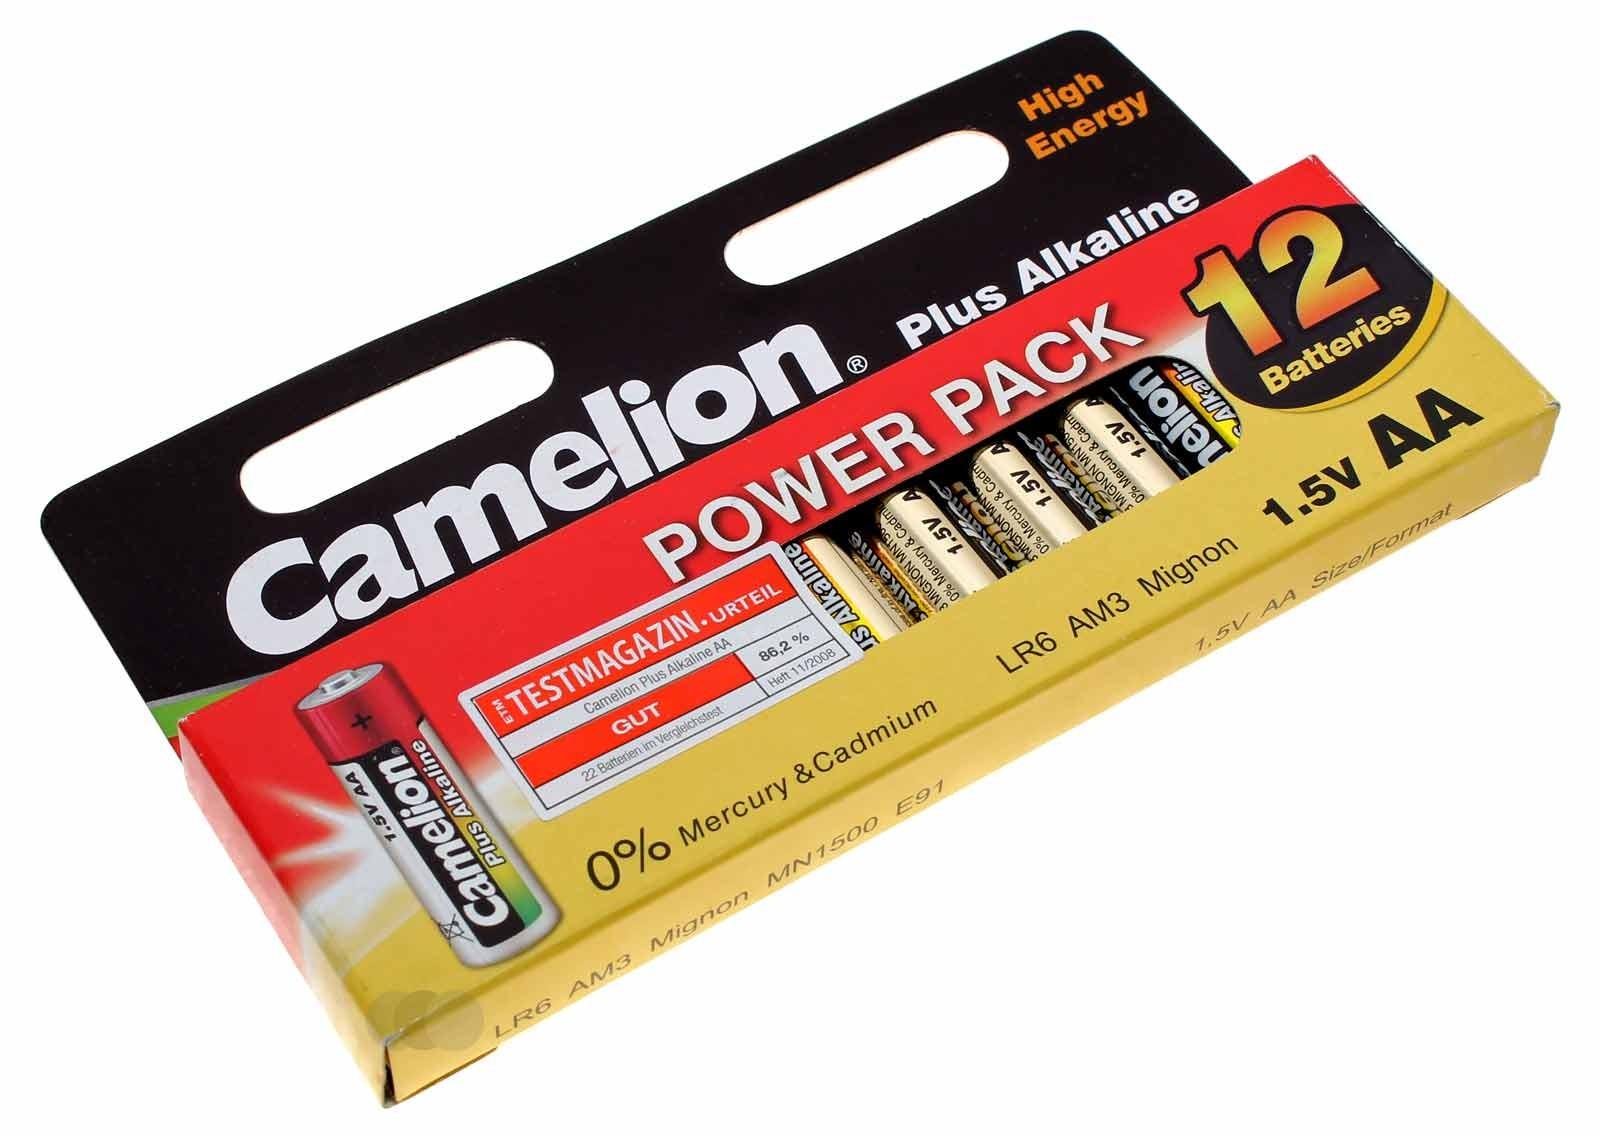 12er Power Pack Camelion Plus Alkaline Batterien AA Mignon [LR6-HP12] LR6 AM3 MN1500 E91 | 1,5V 2700mAh